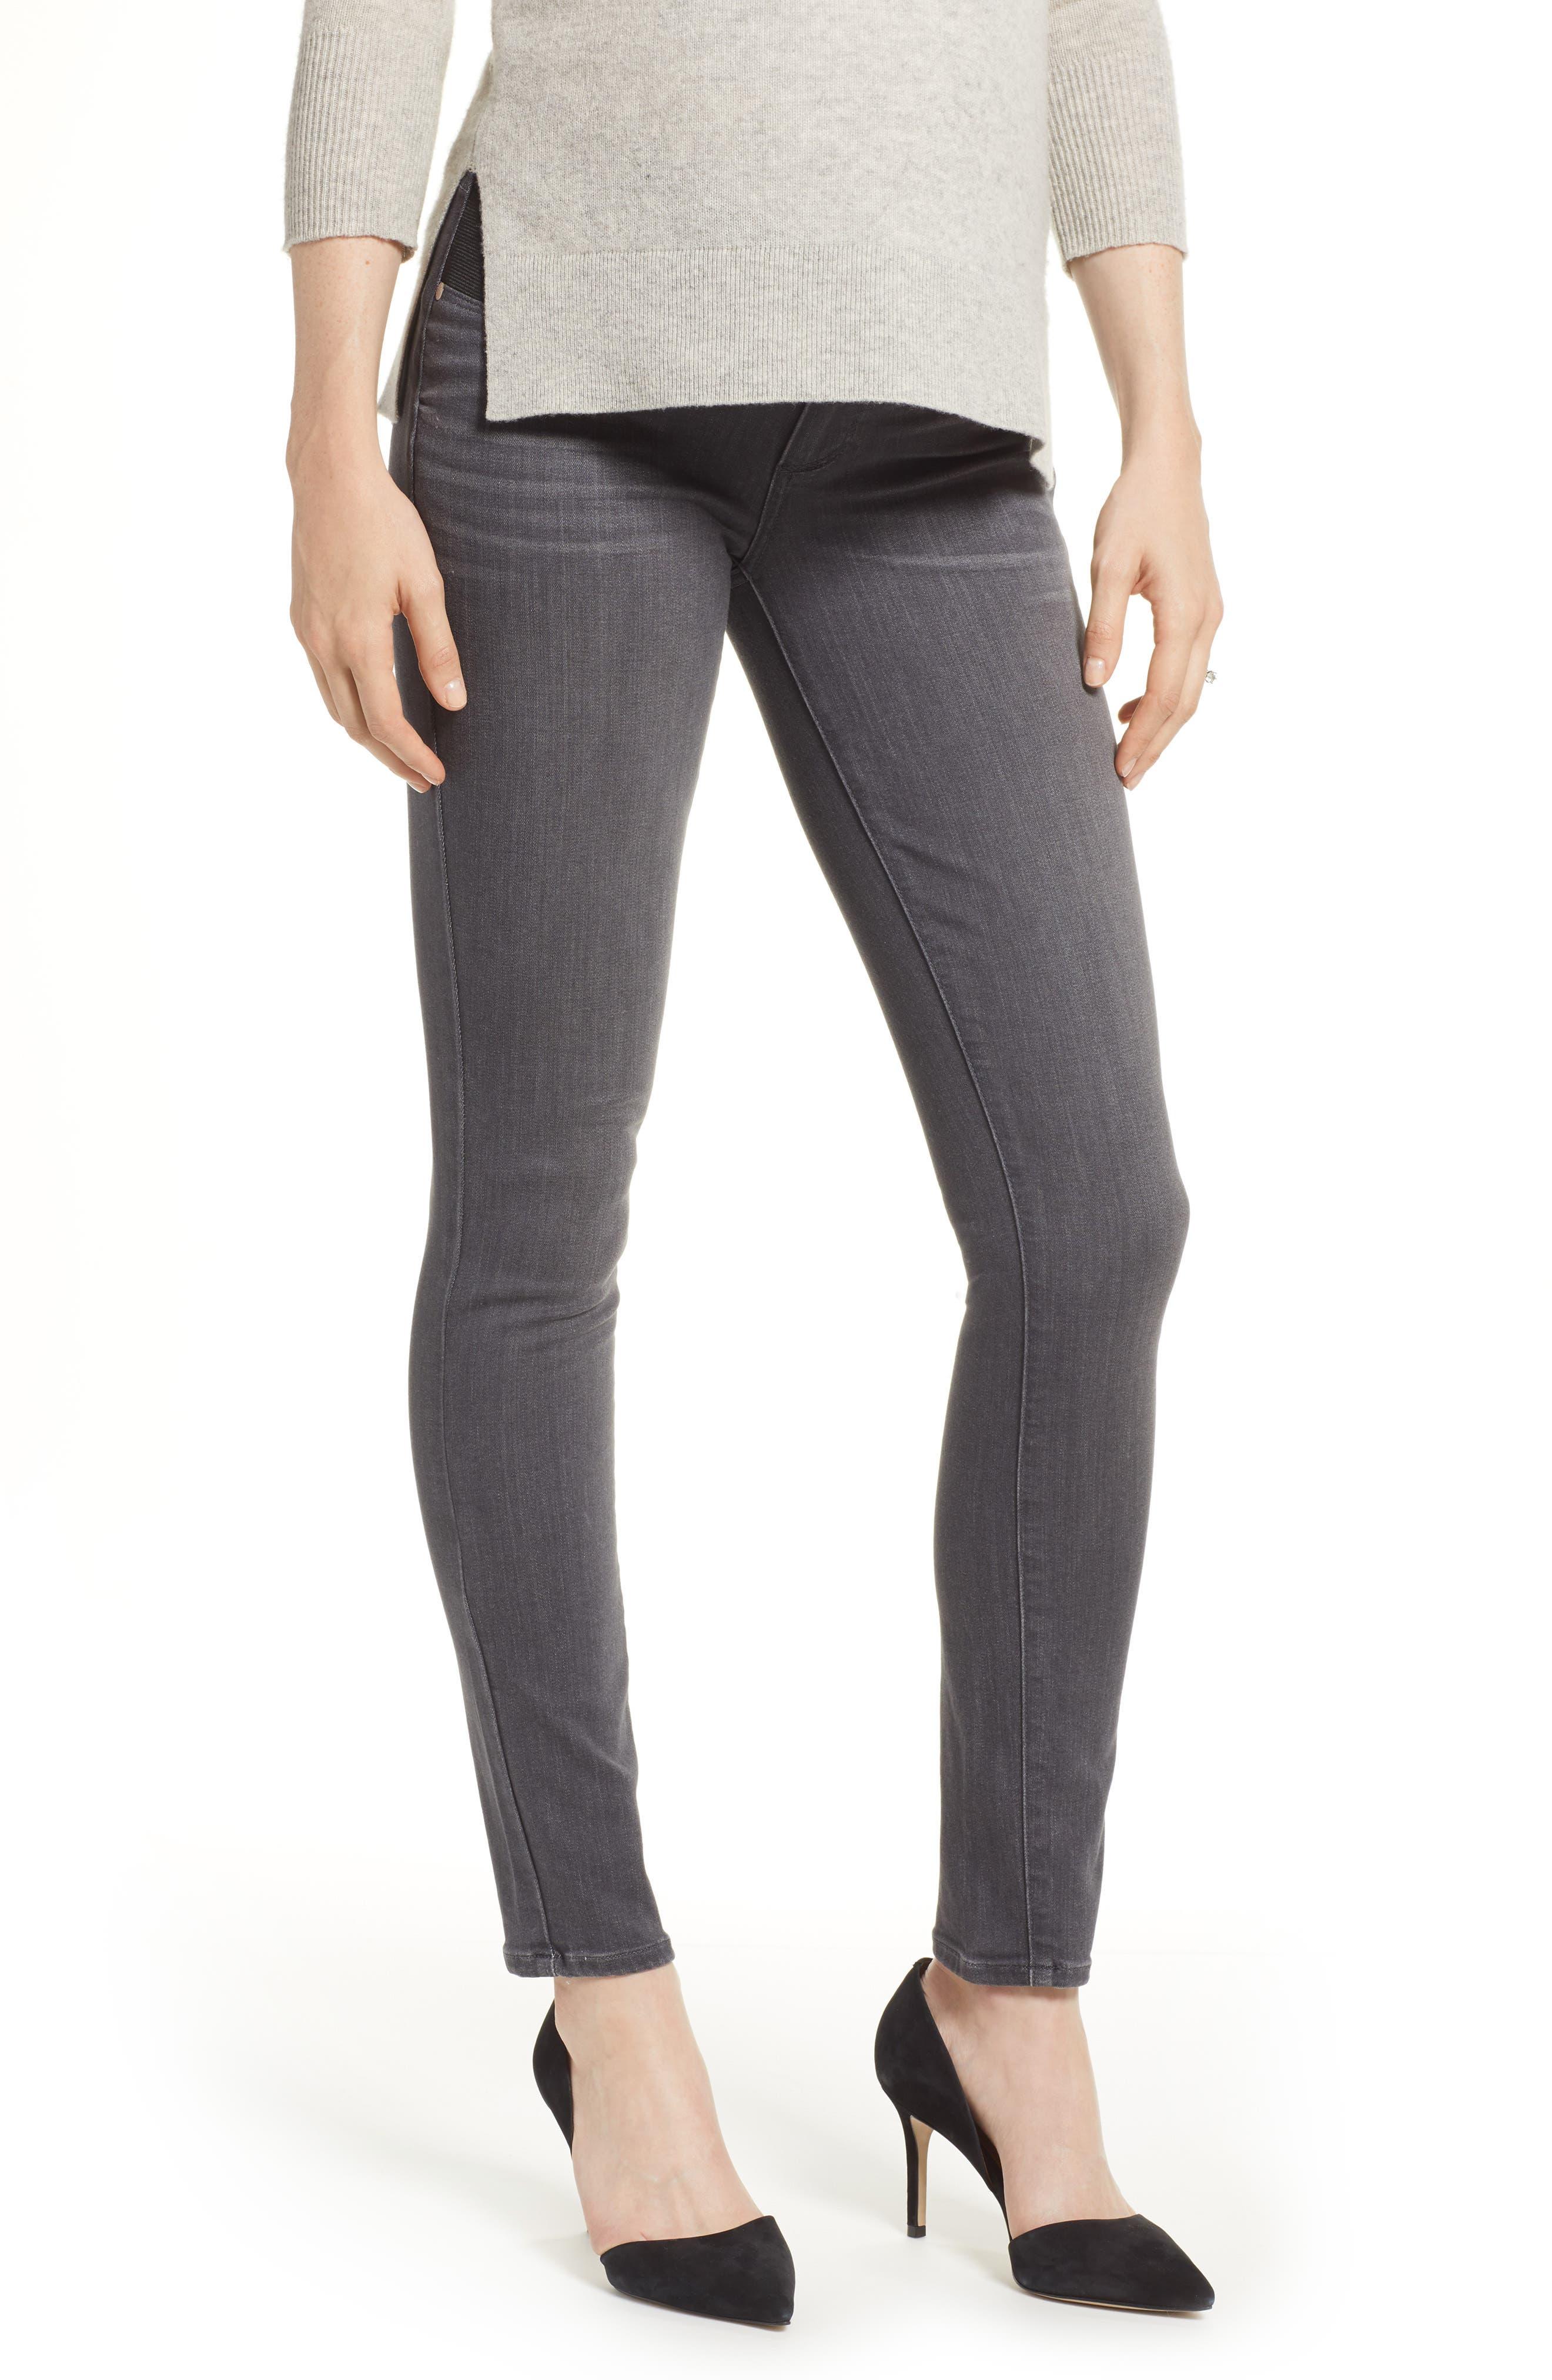 Women's Paige Transcend - Verdugo Maternity Skinny Jeans